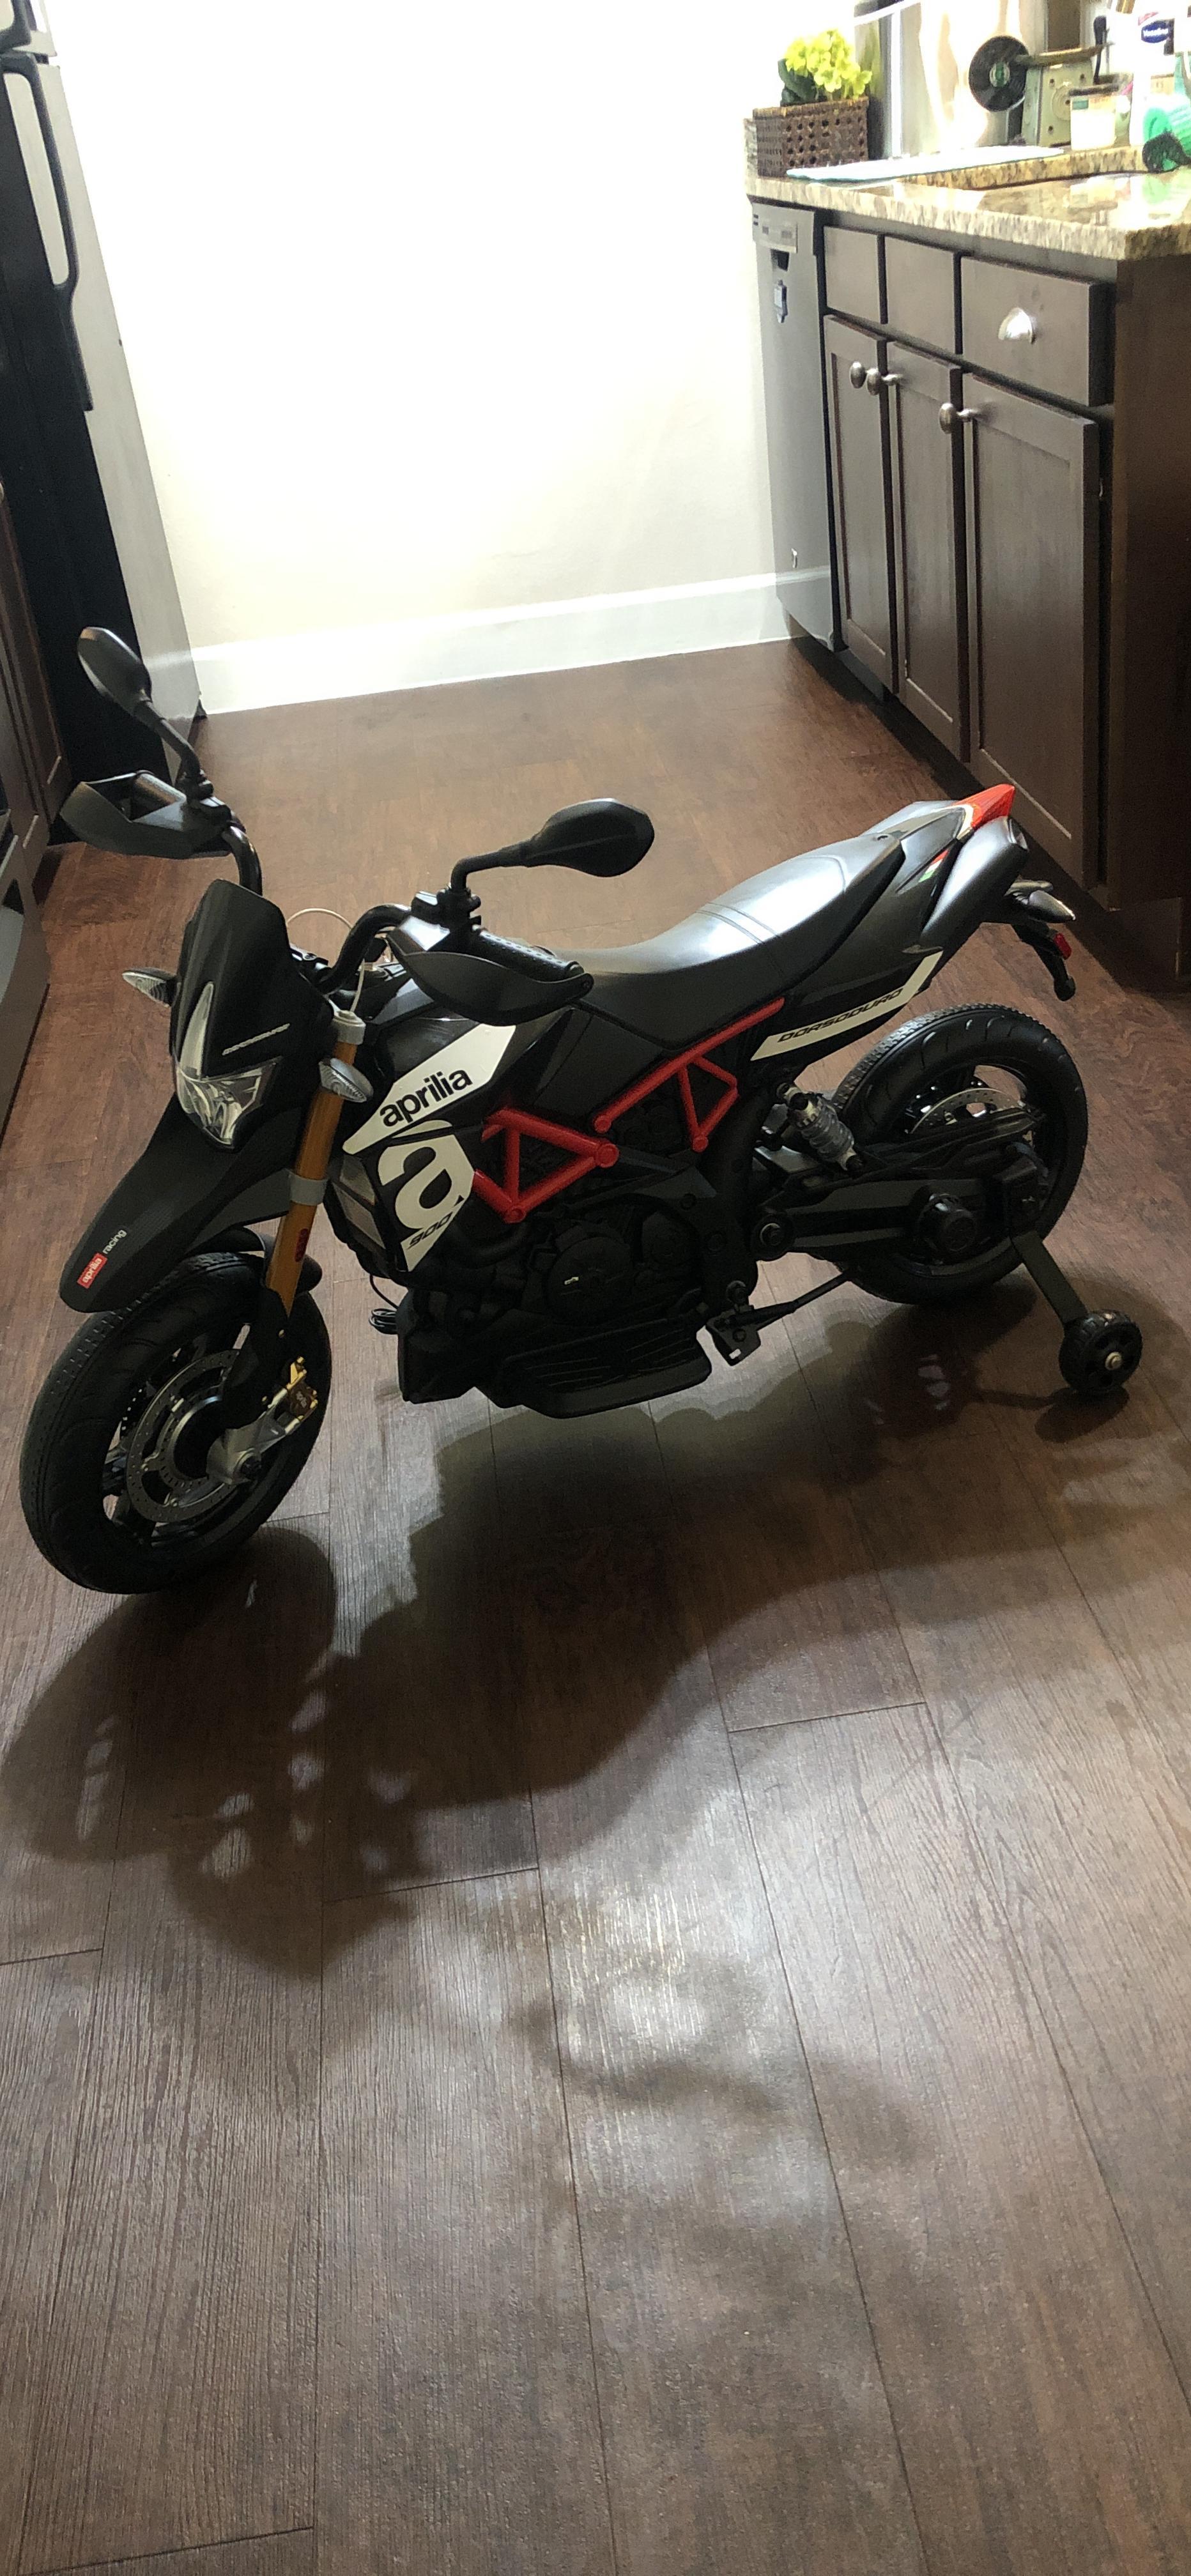 Aprilia Licensed 12V Kids Toy Motorcycle, Black photo review